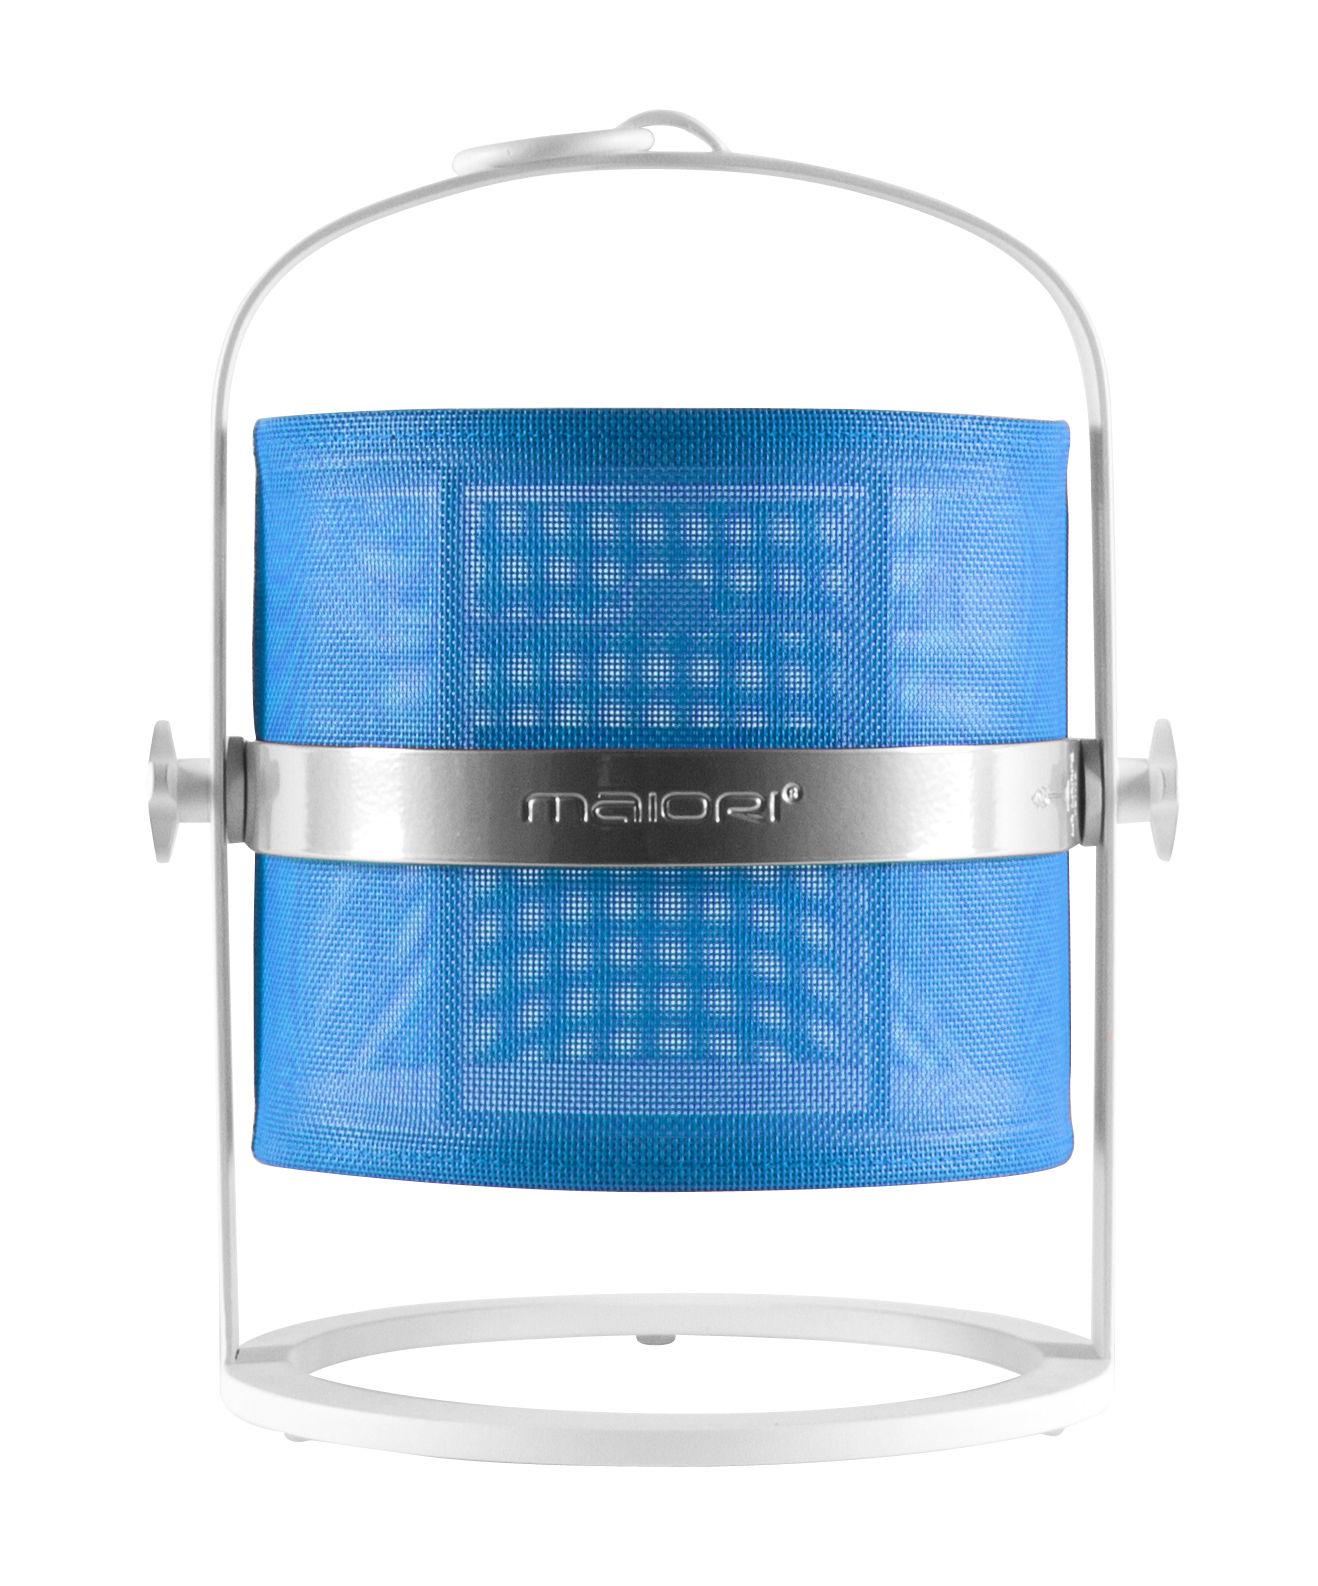 solarlampe la lampe petite led von maiori wei blau. Black Bedroom Furniture Sets. Home Design Ideas